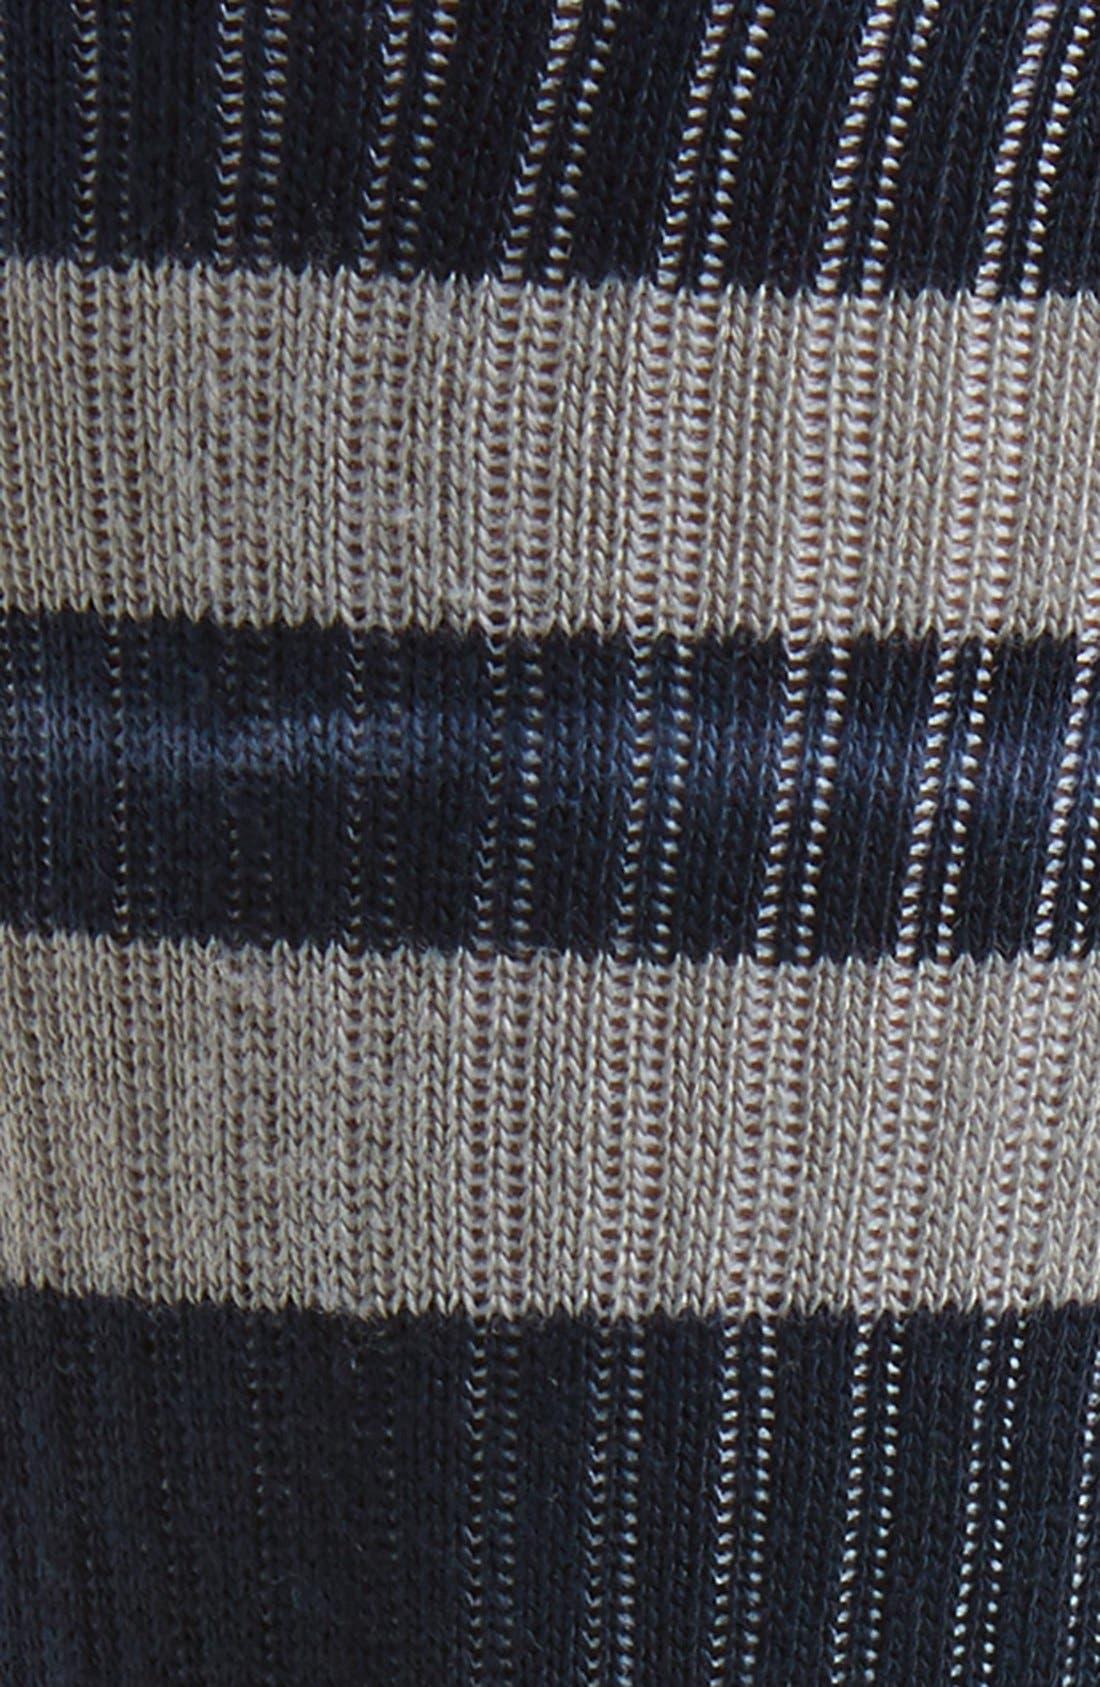 6AM Classic Crew Socks,                             Alternate thumbnail 2, color,                             001